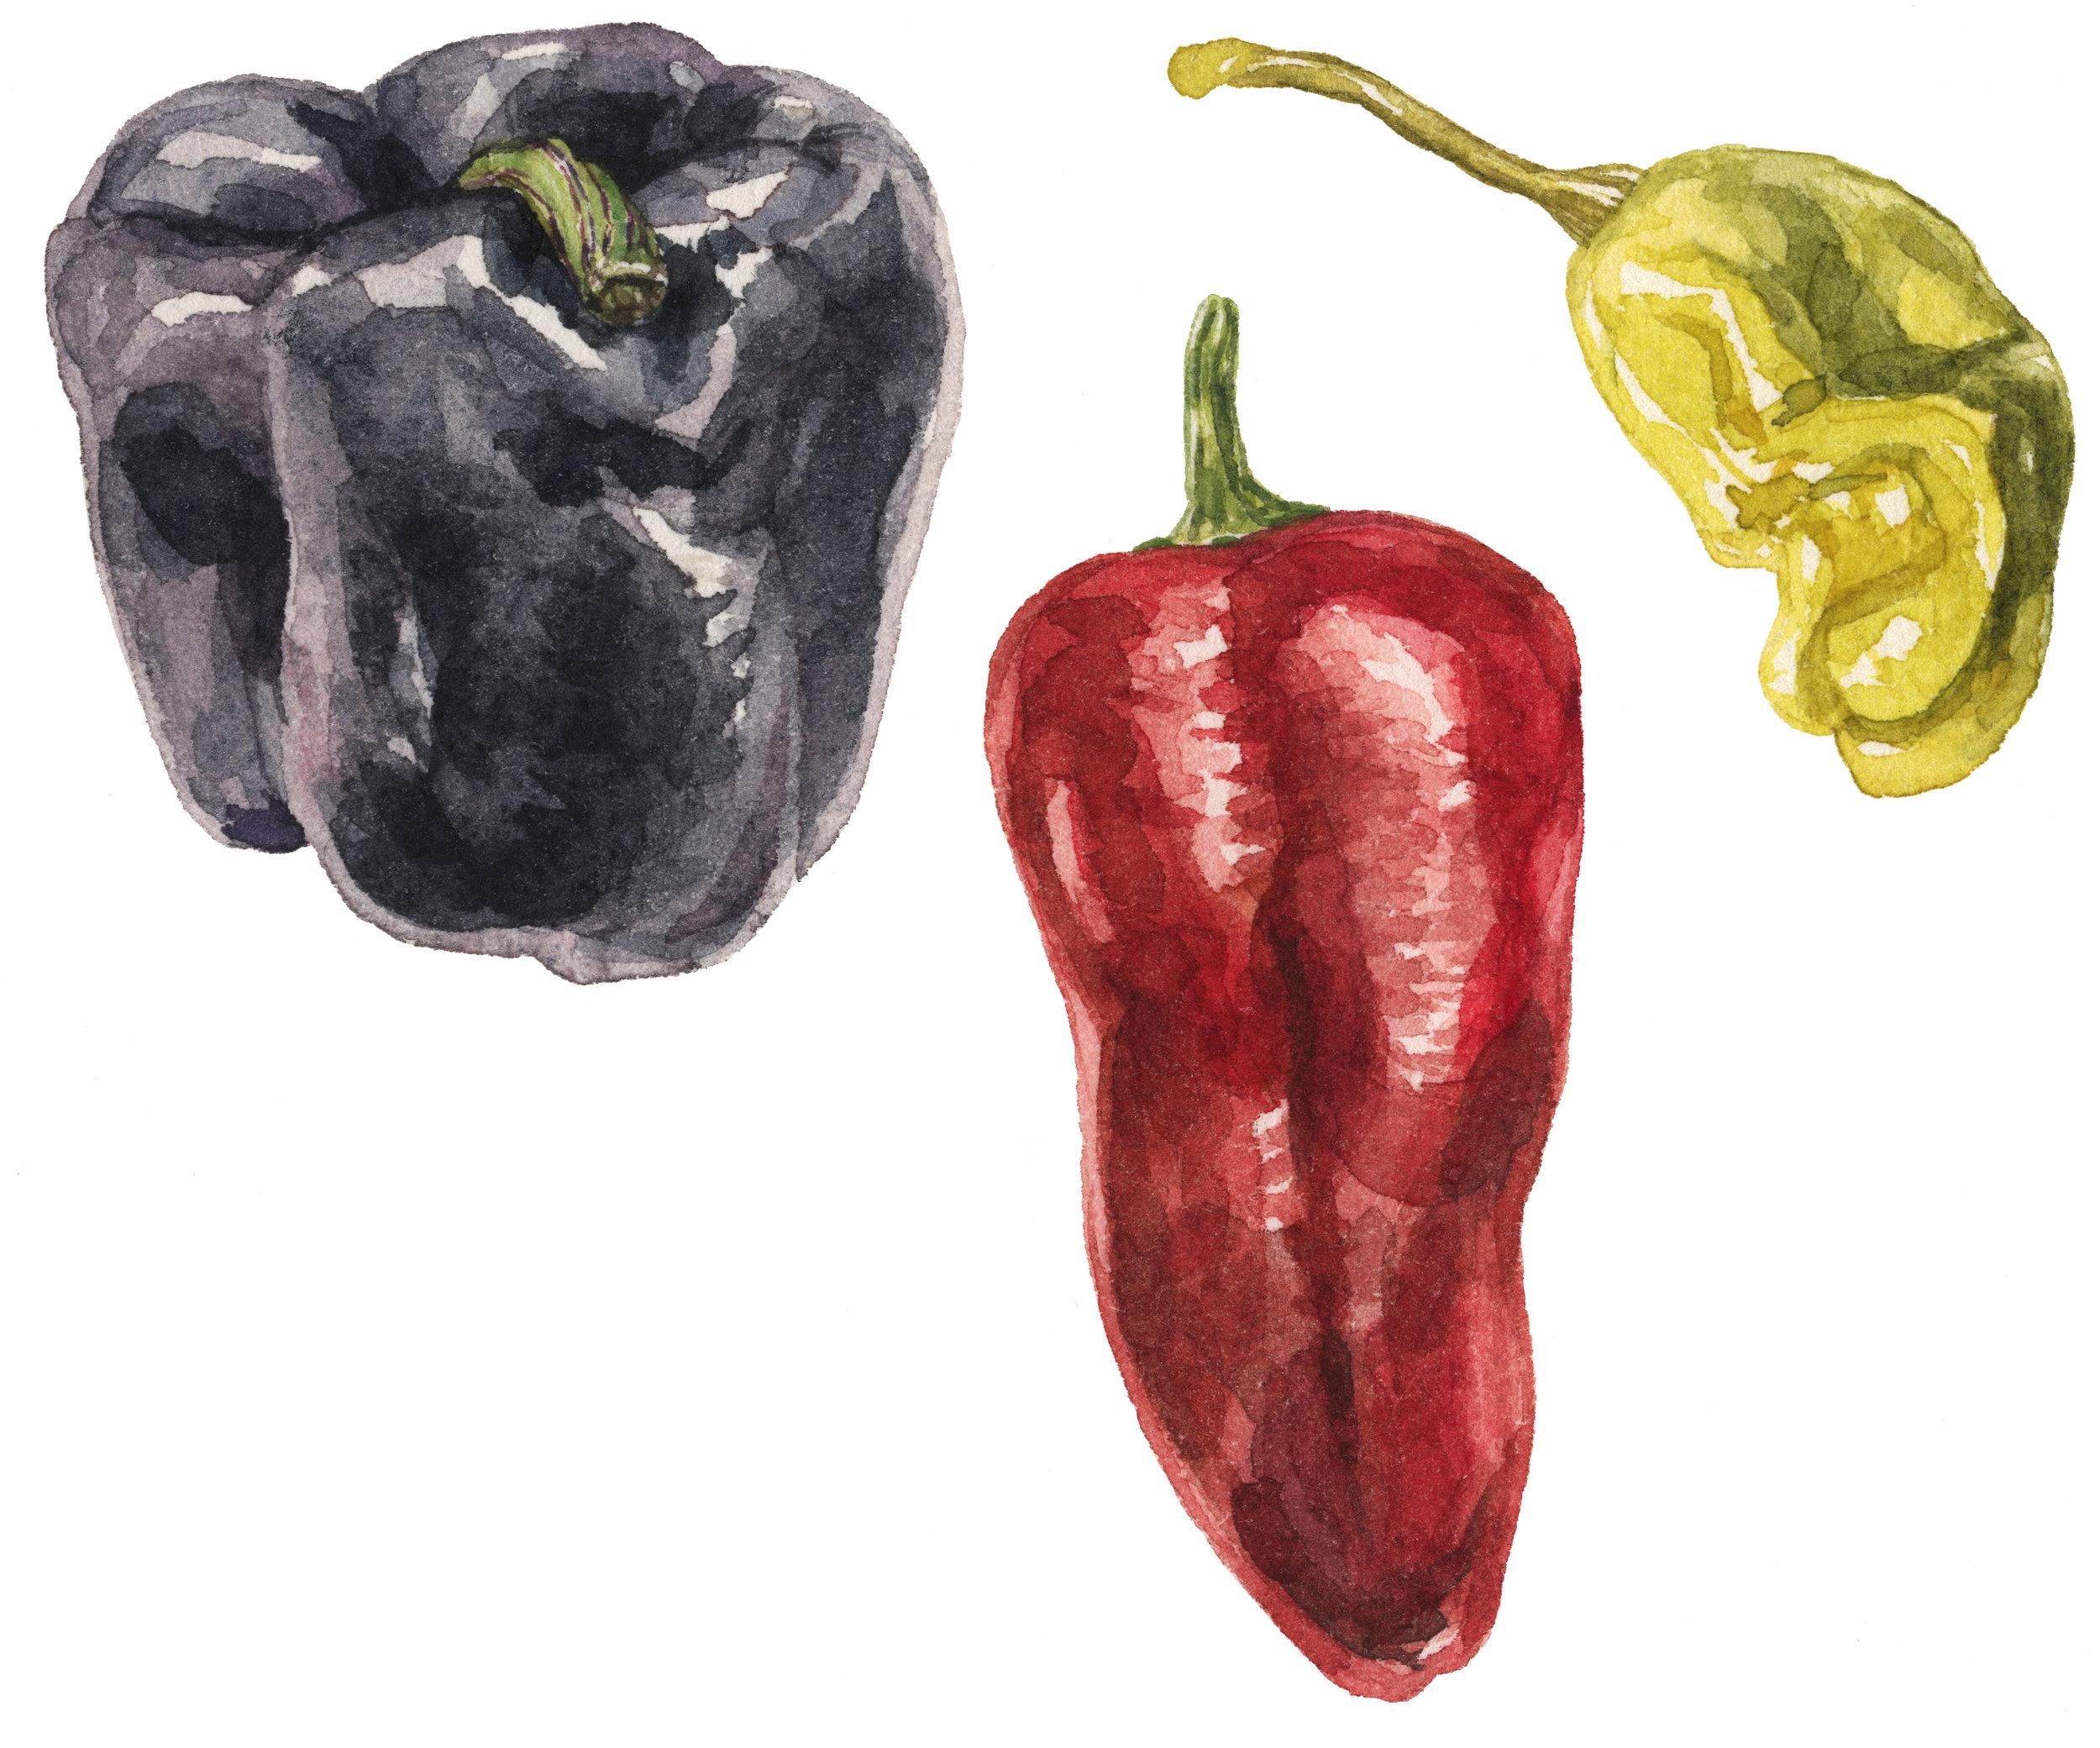 22-sweet-peppers-lrg.jpg